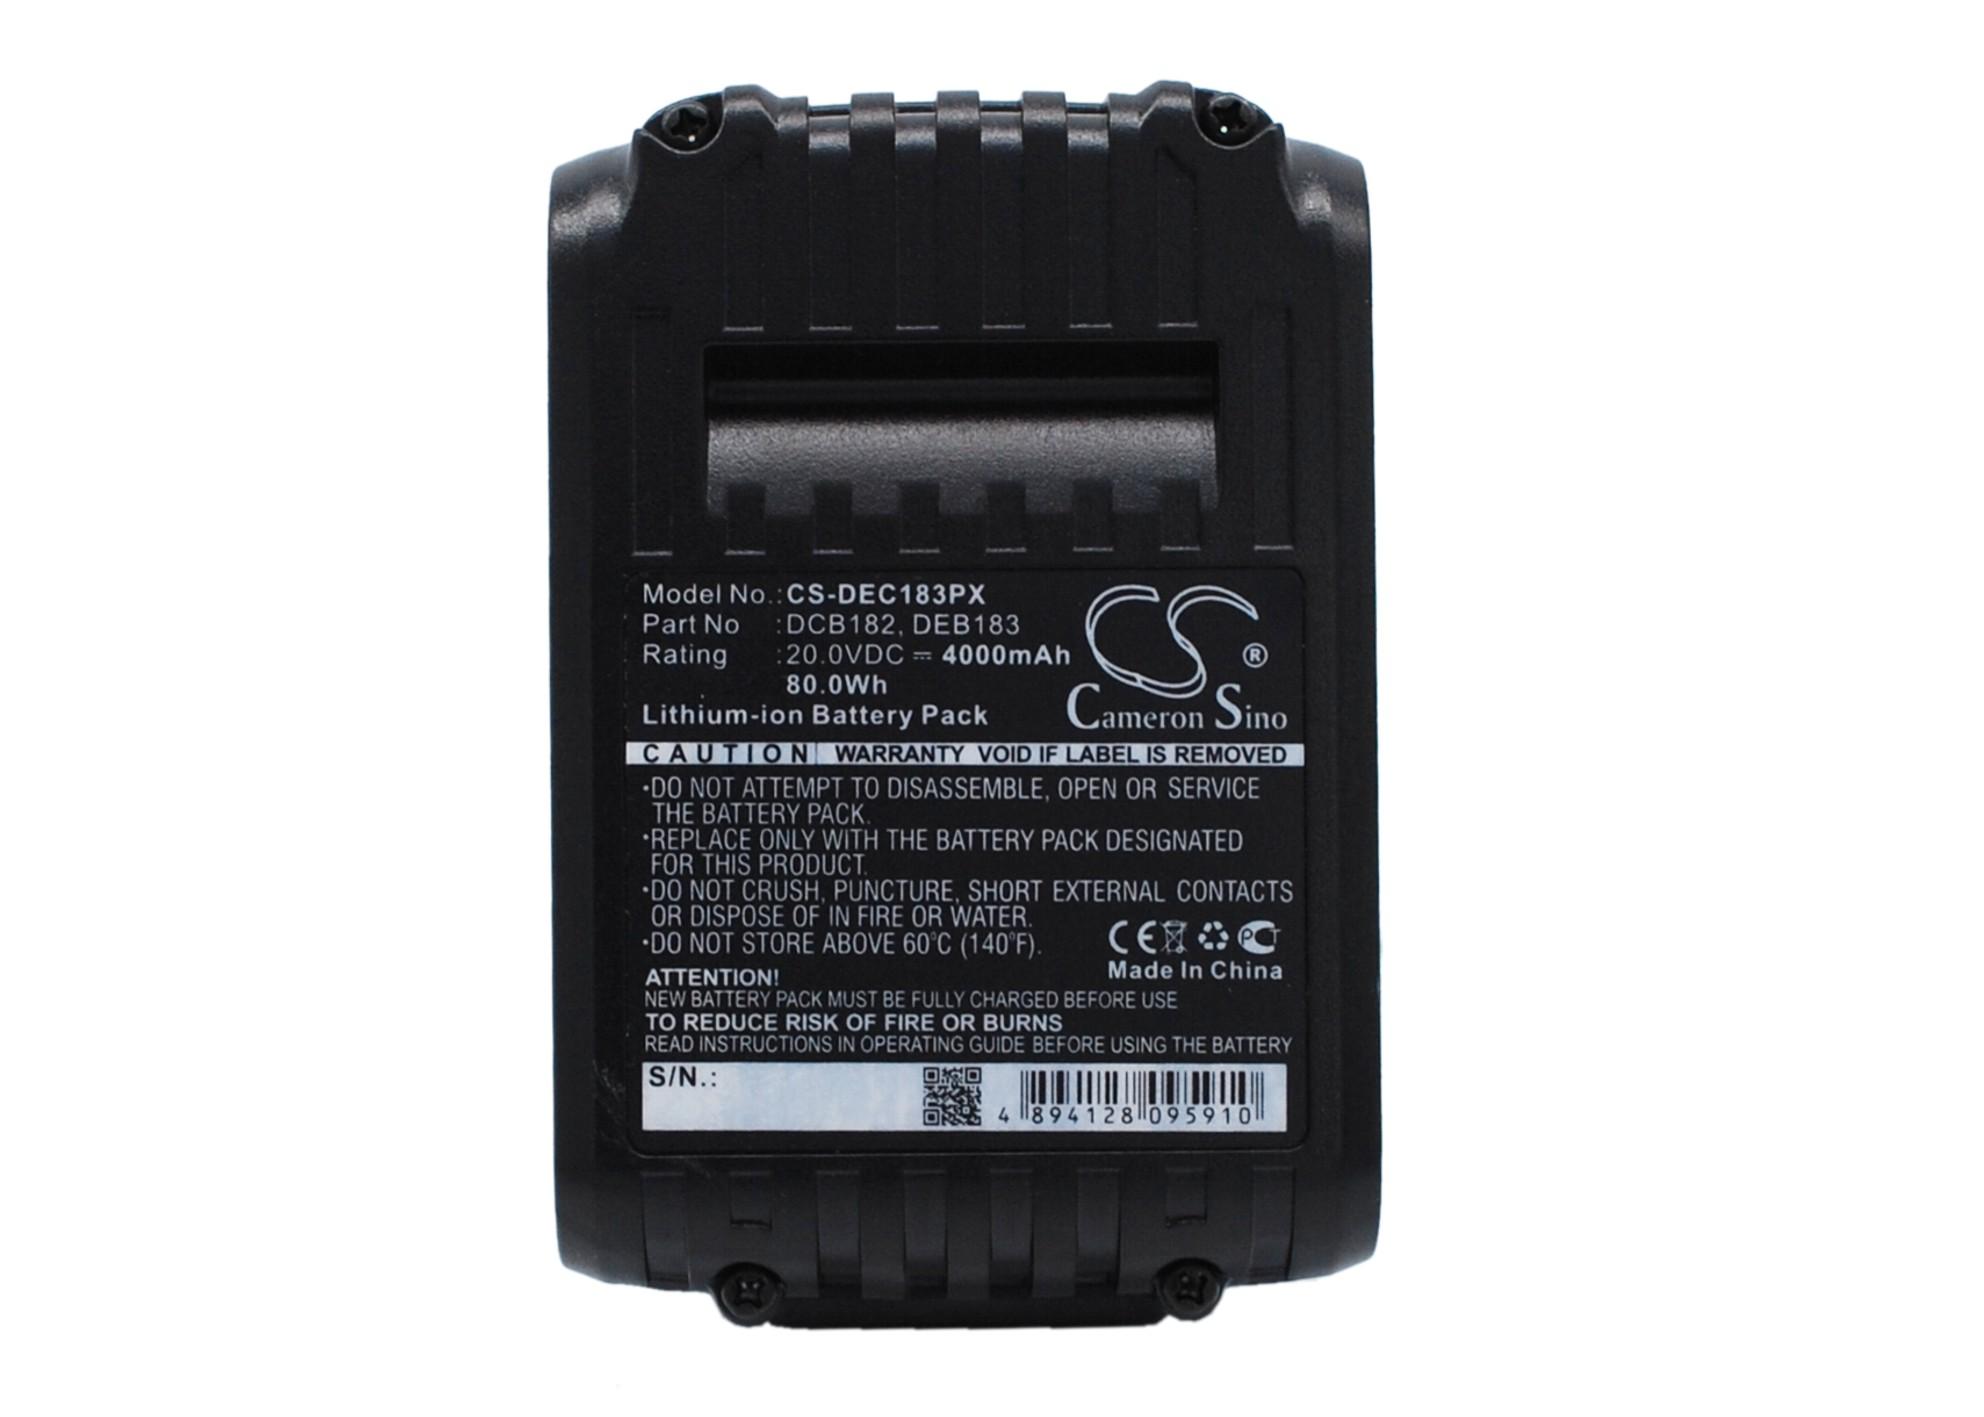 Cameron Sino baterie do nářadí pro DEWALT DCS331B 20V Li-ion 4000mAh černá - neoriginální